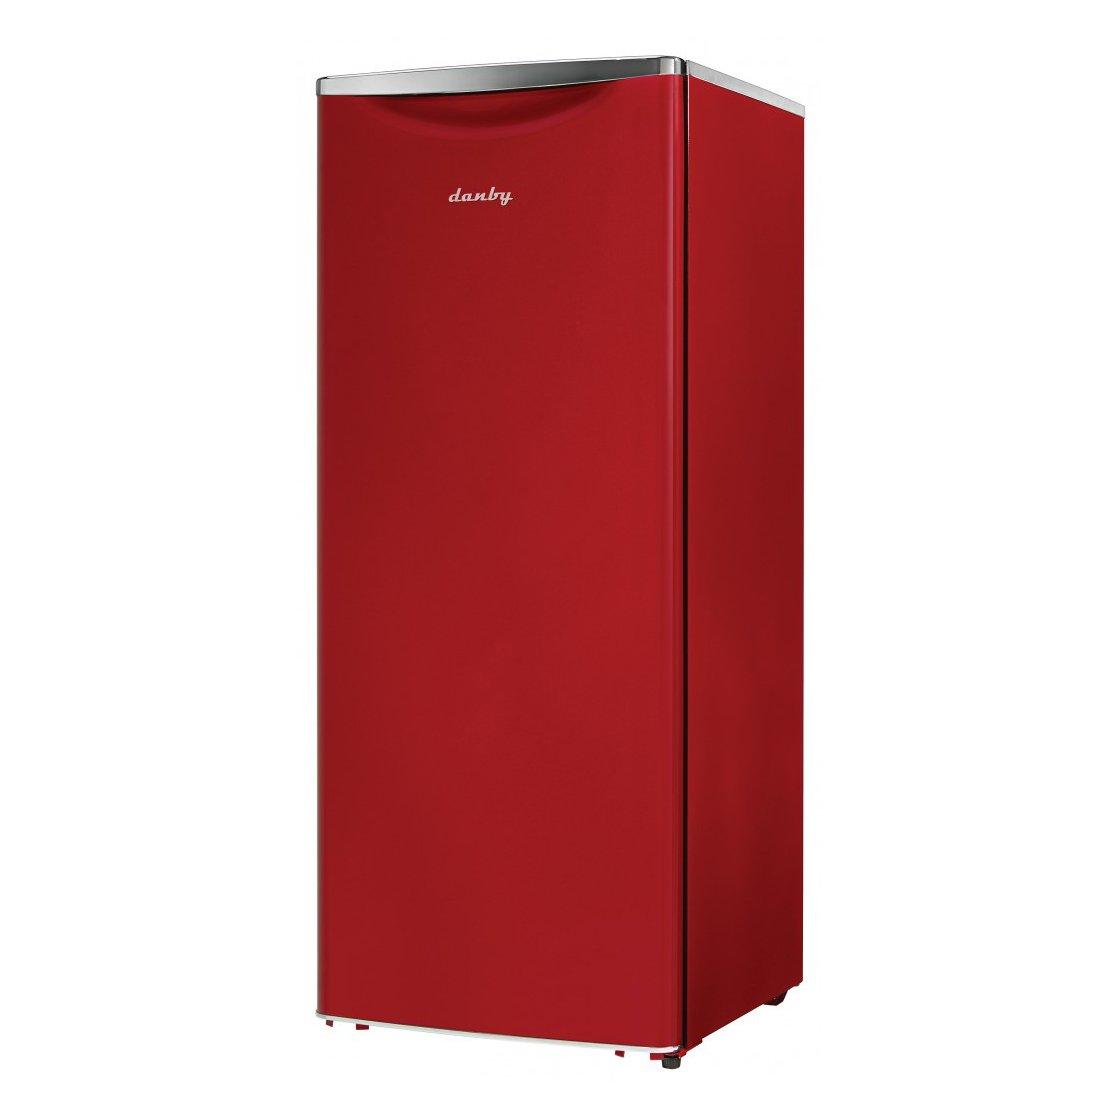 Danby DAR110A2LDB 11.0 cu.ft. Contemporary Classic All Refrigerator, Red